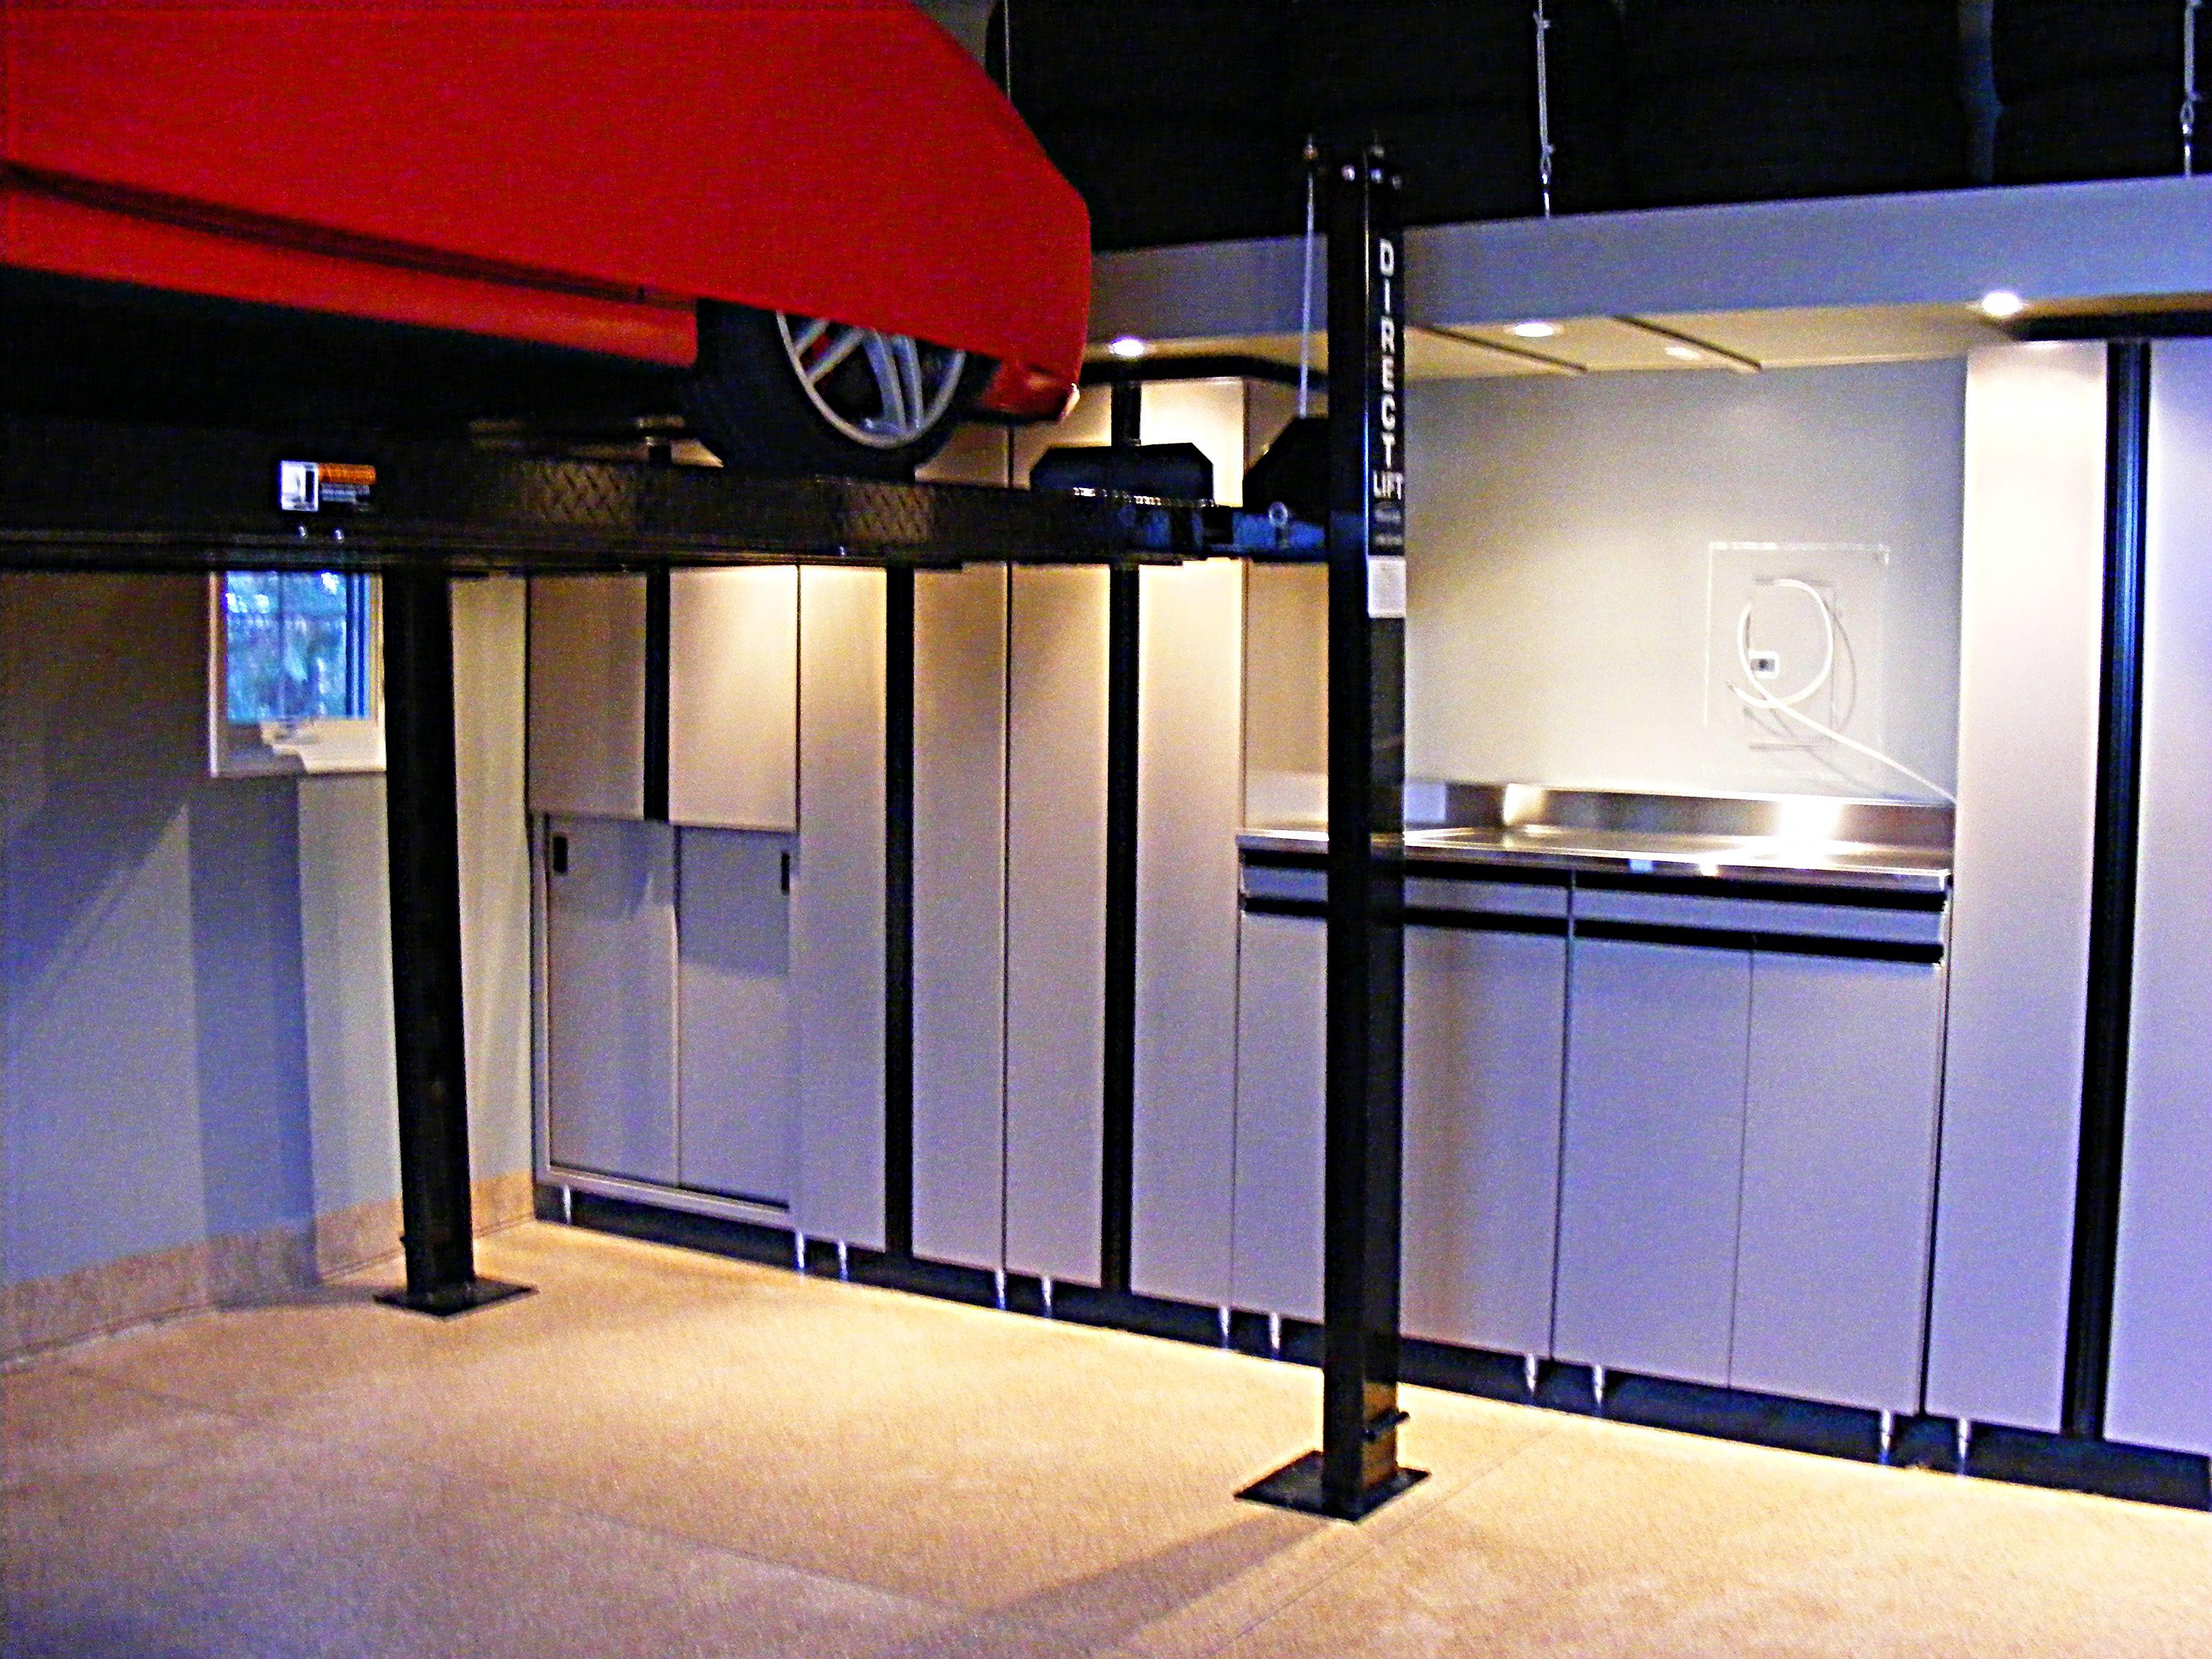 Large Garage Cabinets What A Show Piece Auto Car Lift Garage Cabinets Garage